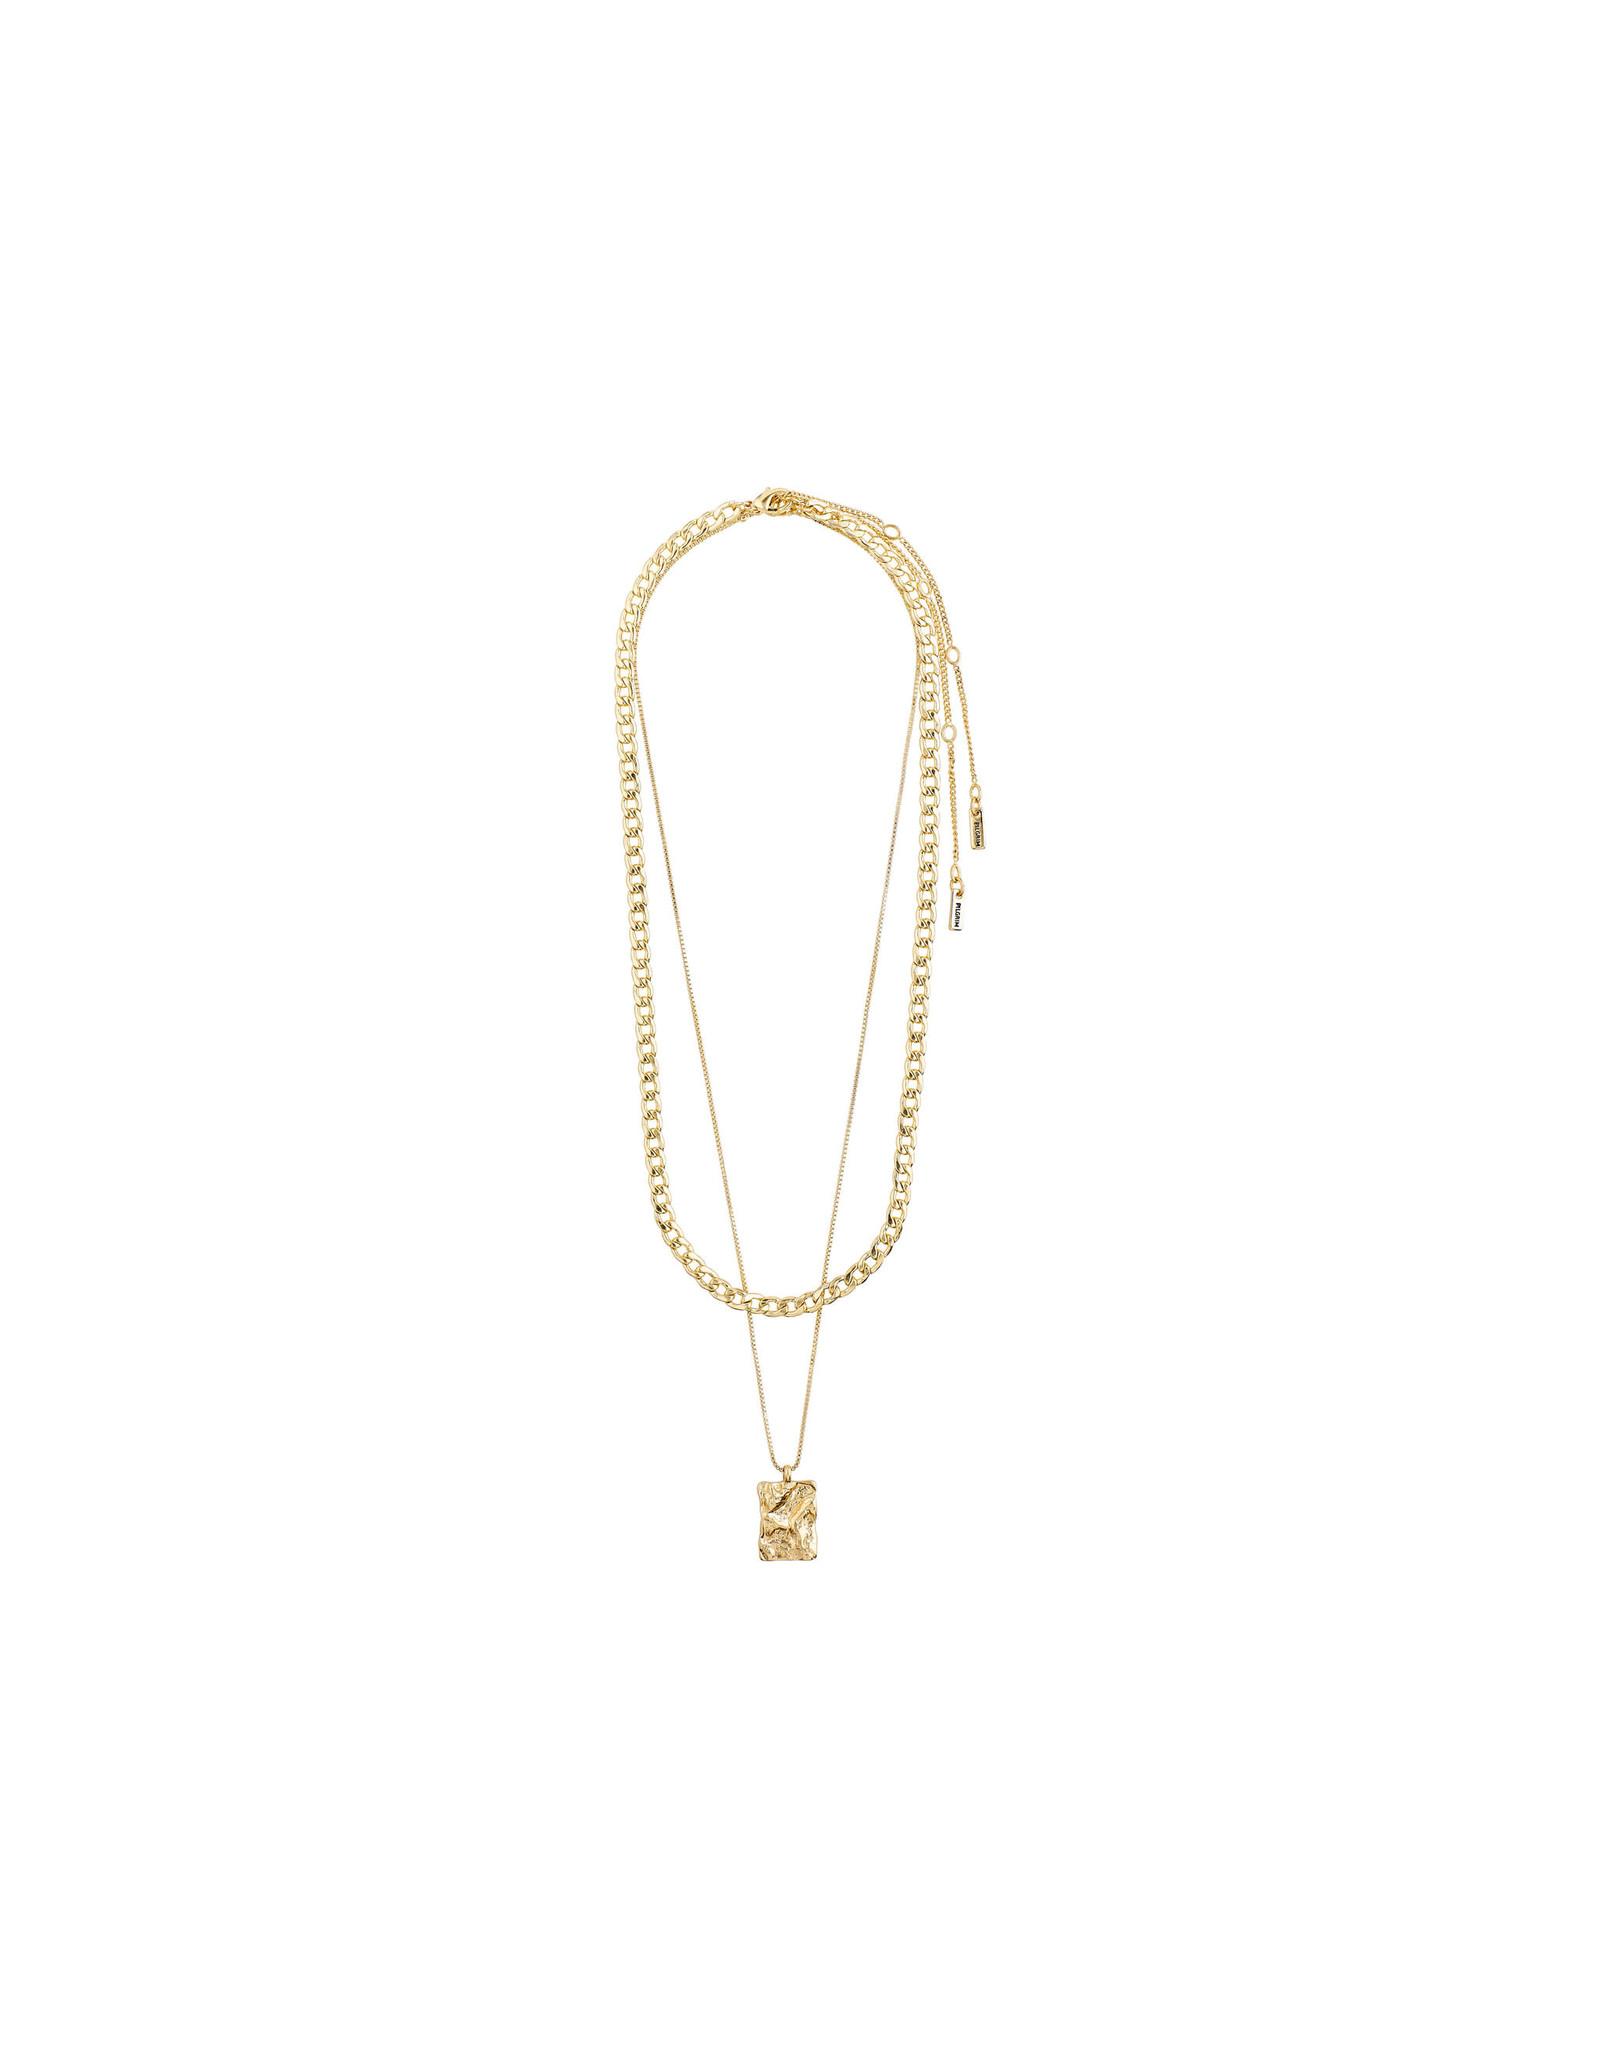 Pilgrim Necklace Bathilda 2 In 1, Gold Plated